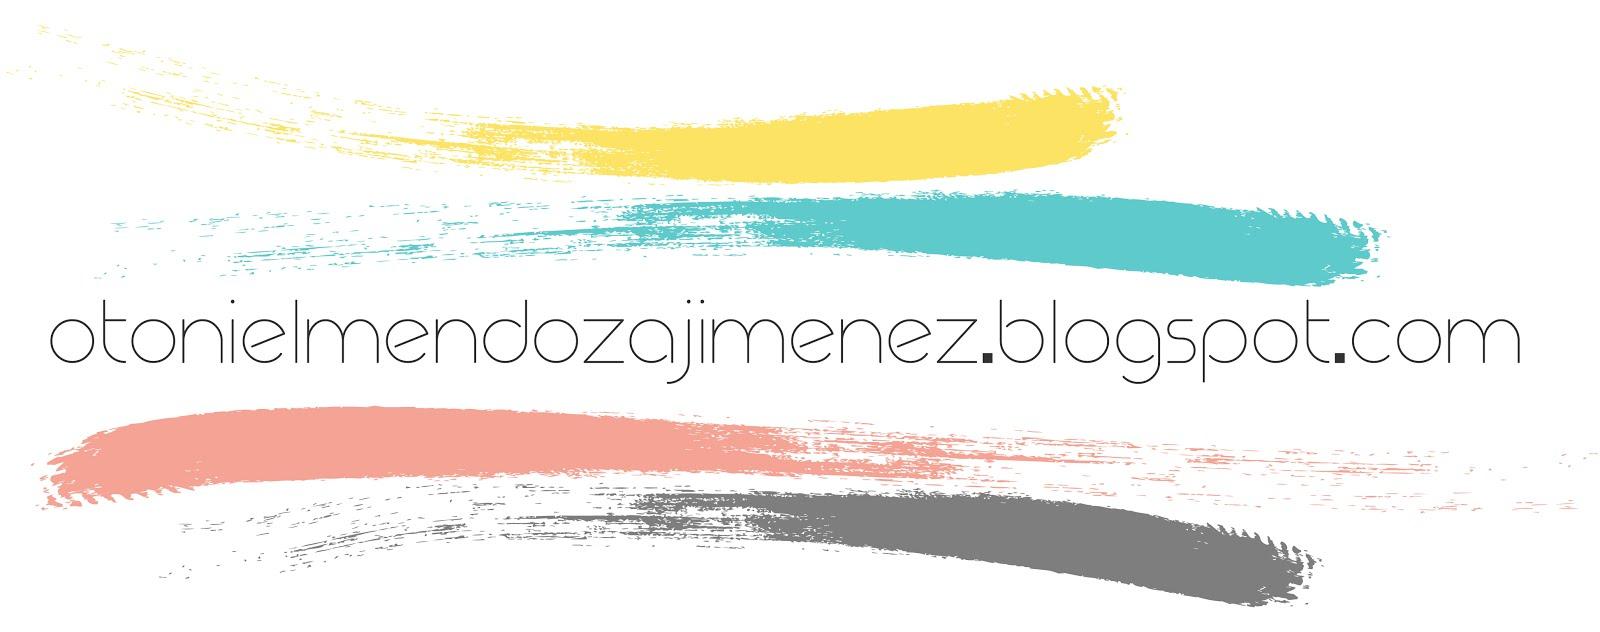 otonielmendozajimenez.blogspot.com